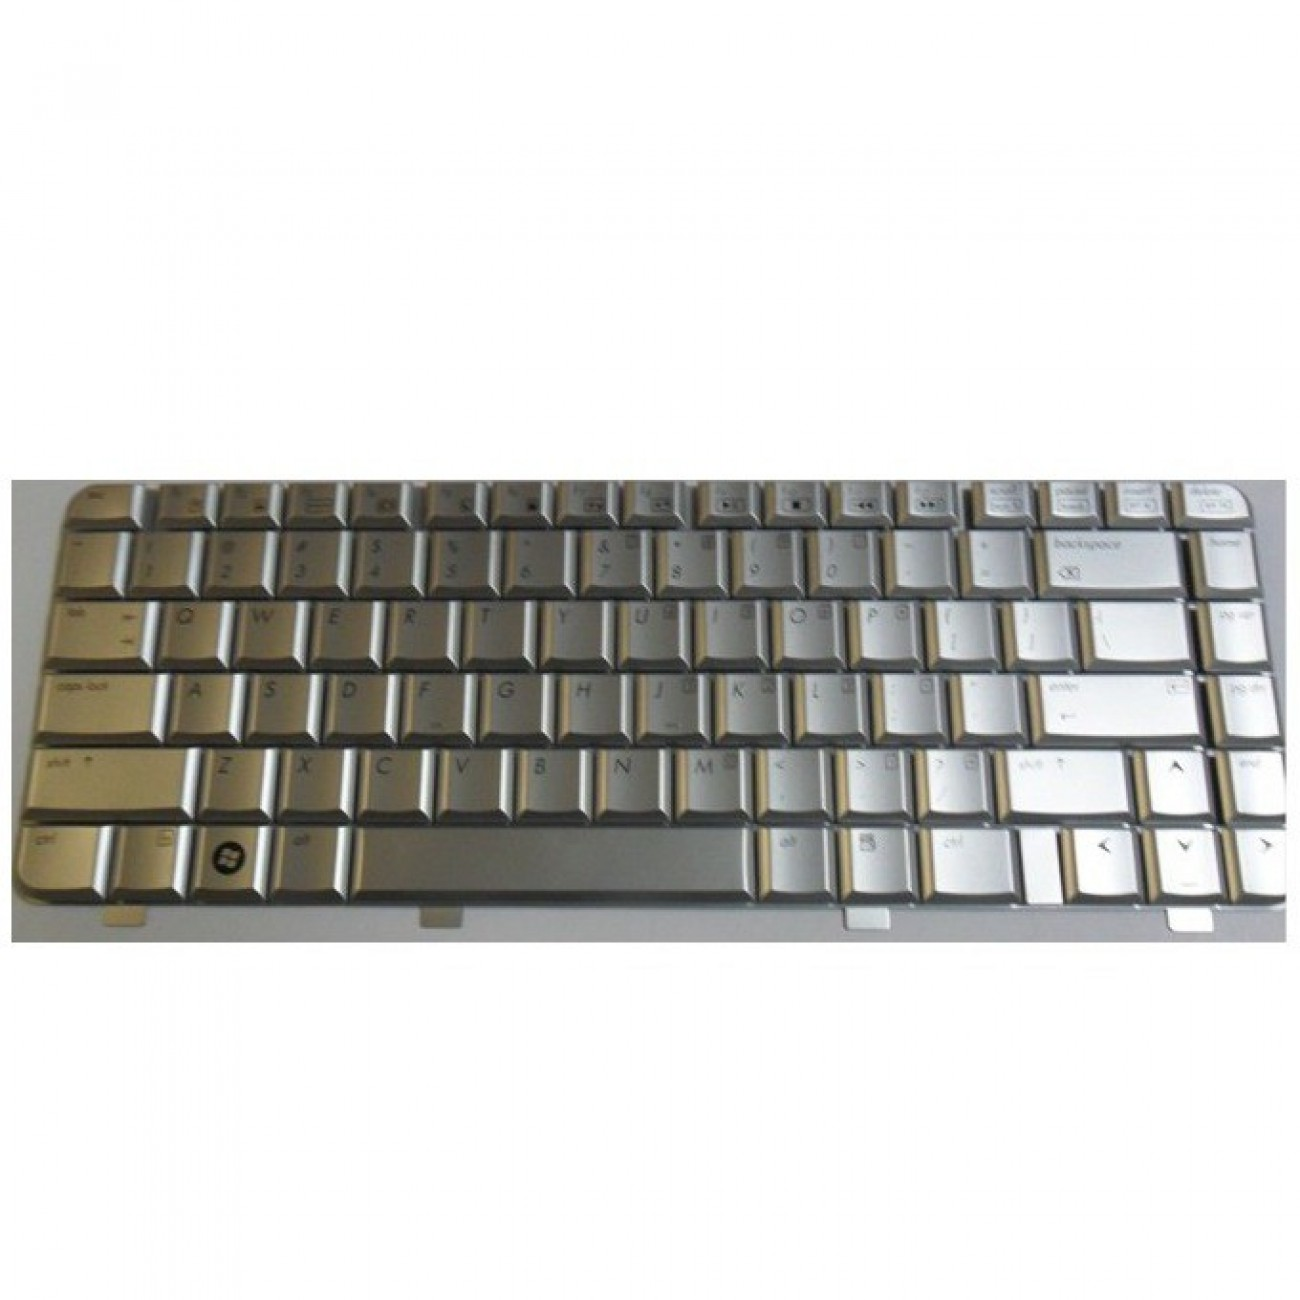 Клавиатура за HP Pavilion dv4 dv4-1000, US, бронзова (кафе) в Резервни части -    Alleop